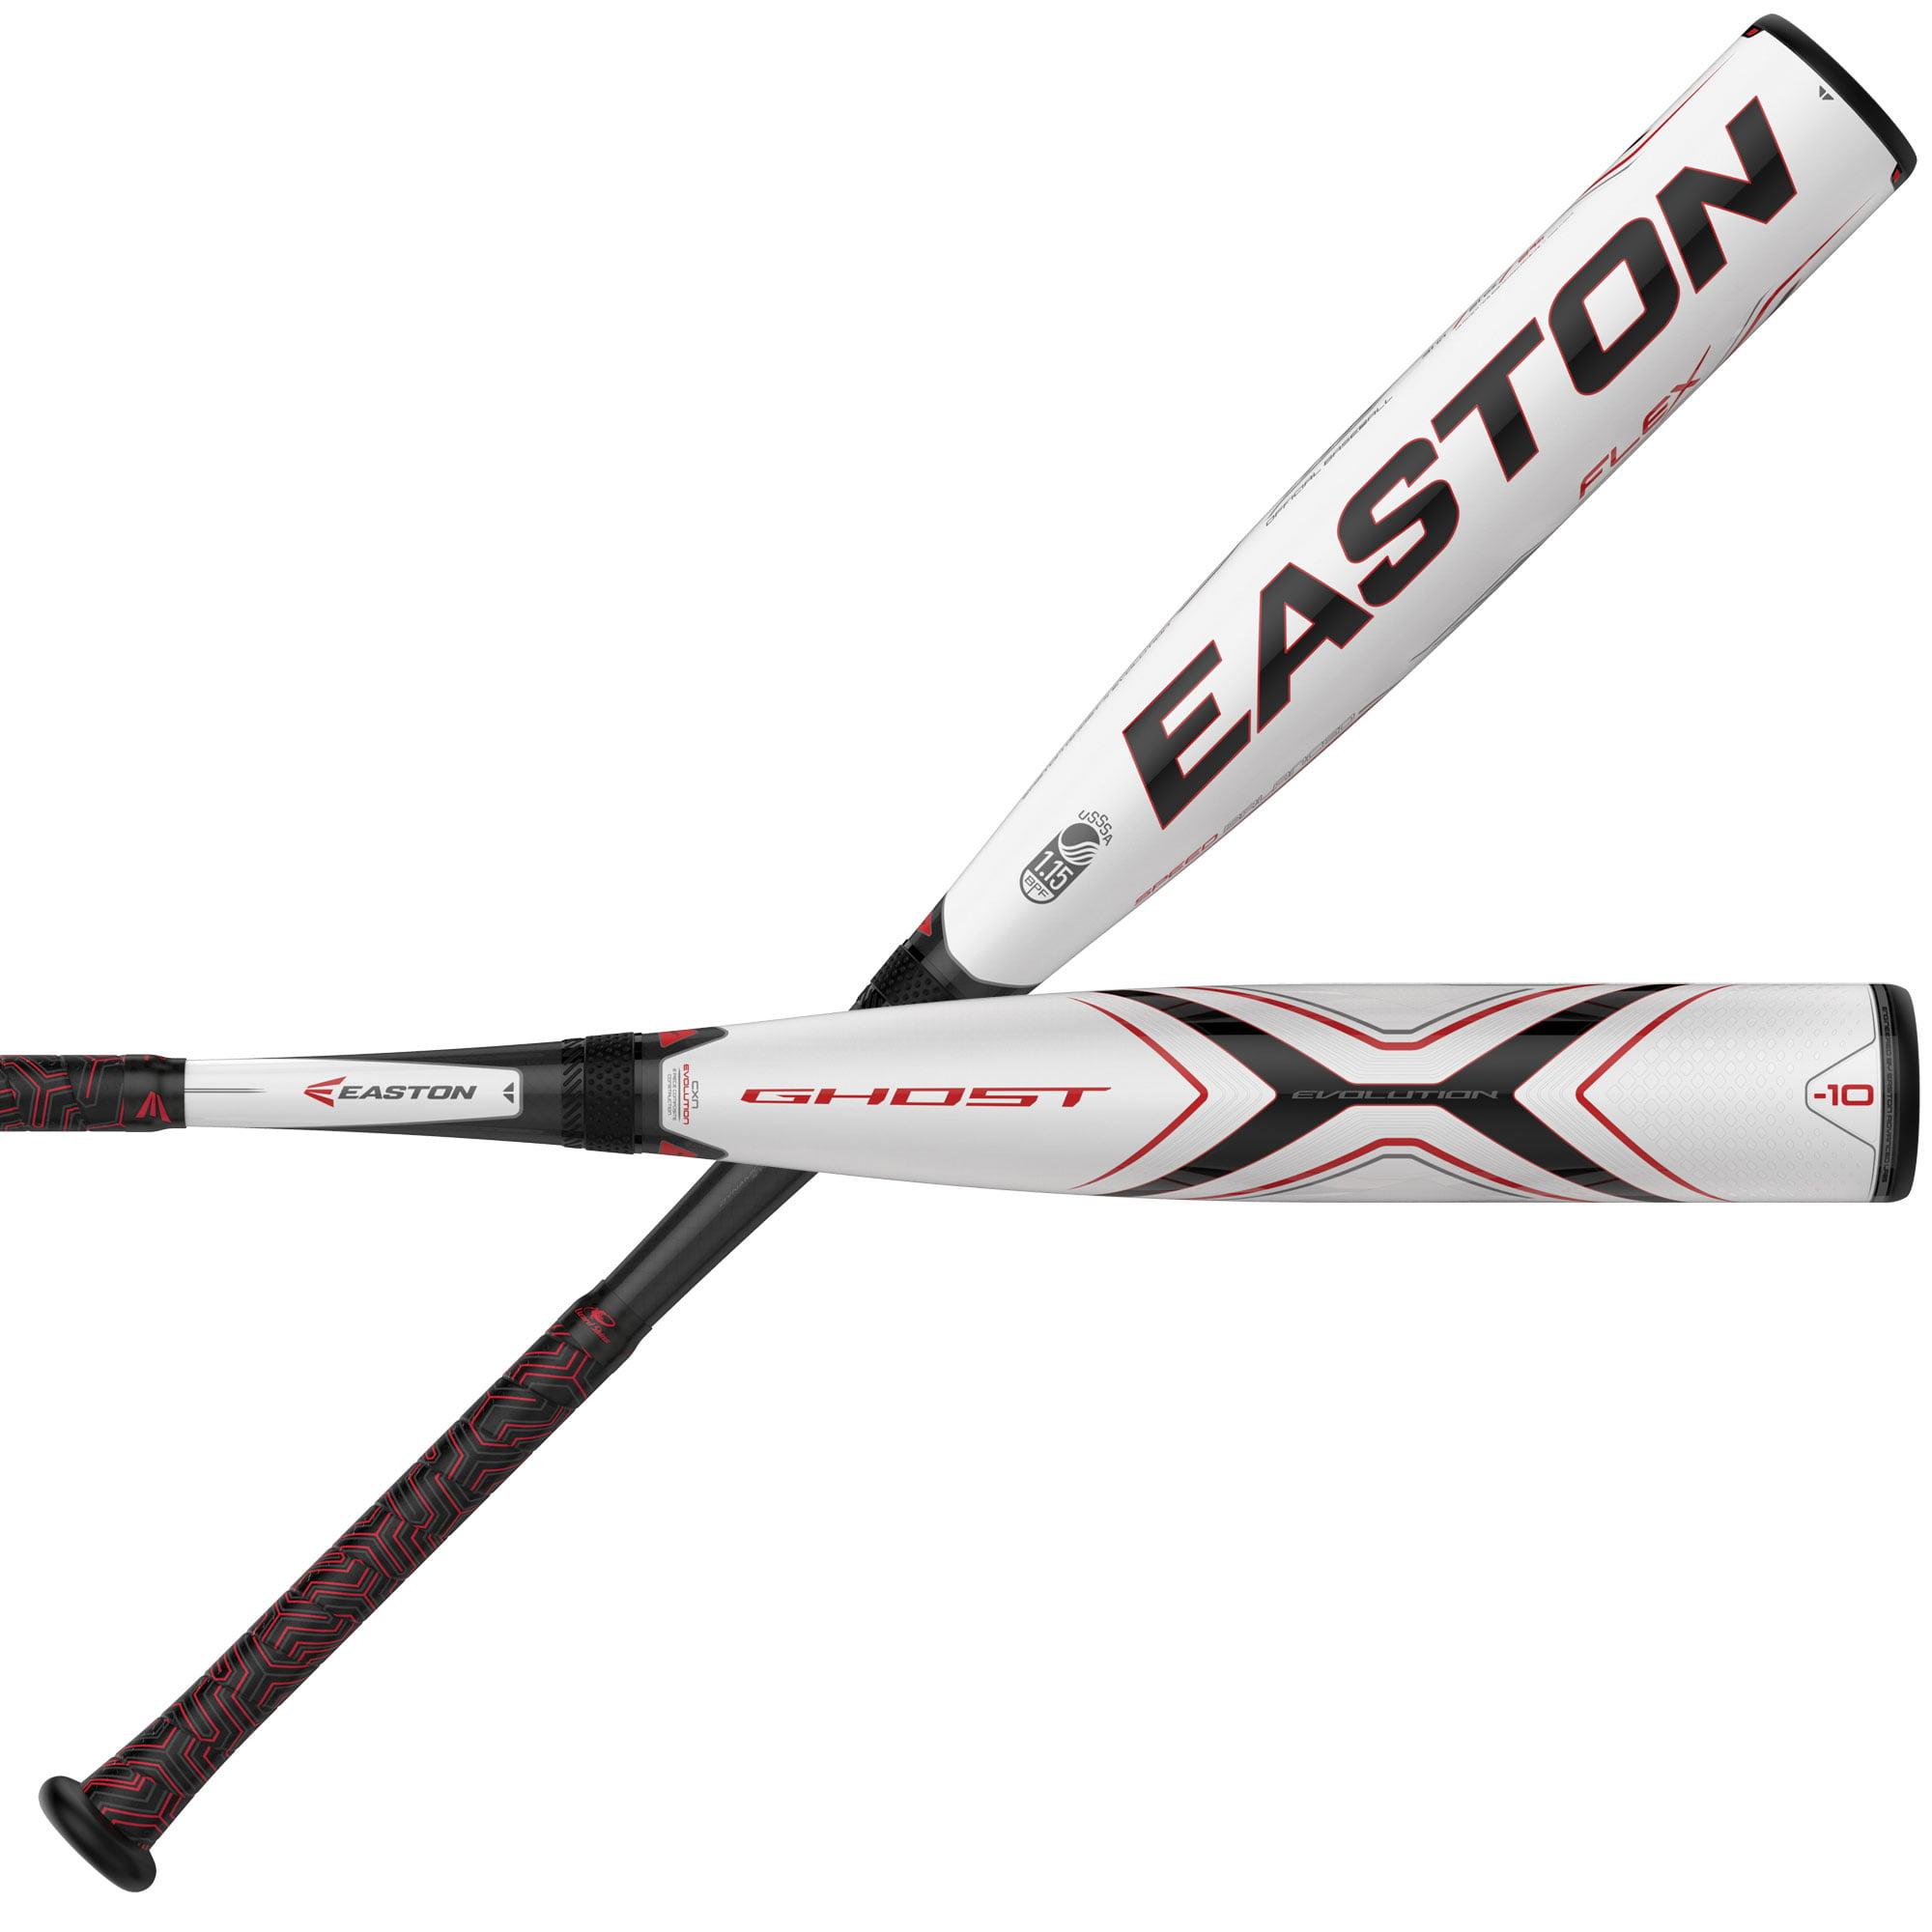 Easton Ghost X Evolution 2 3 4 Sl19gxe10 Senior League Baseball Bat 28 10 Walmart Com Walmart Com